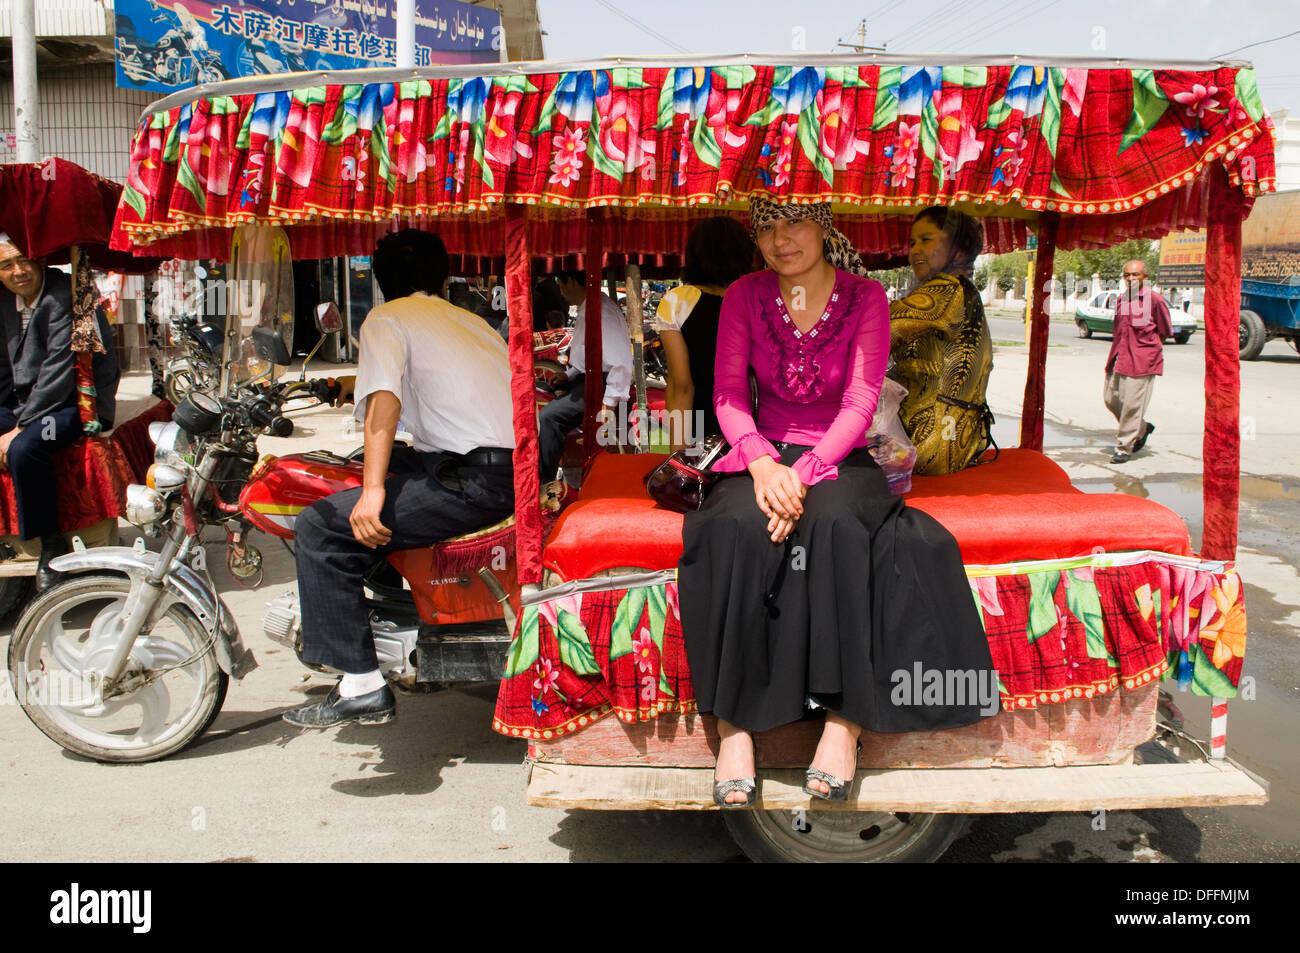 Public transport Xinjiang style. - Stock Image